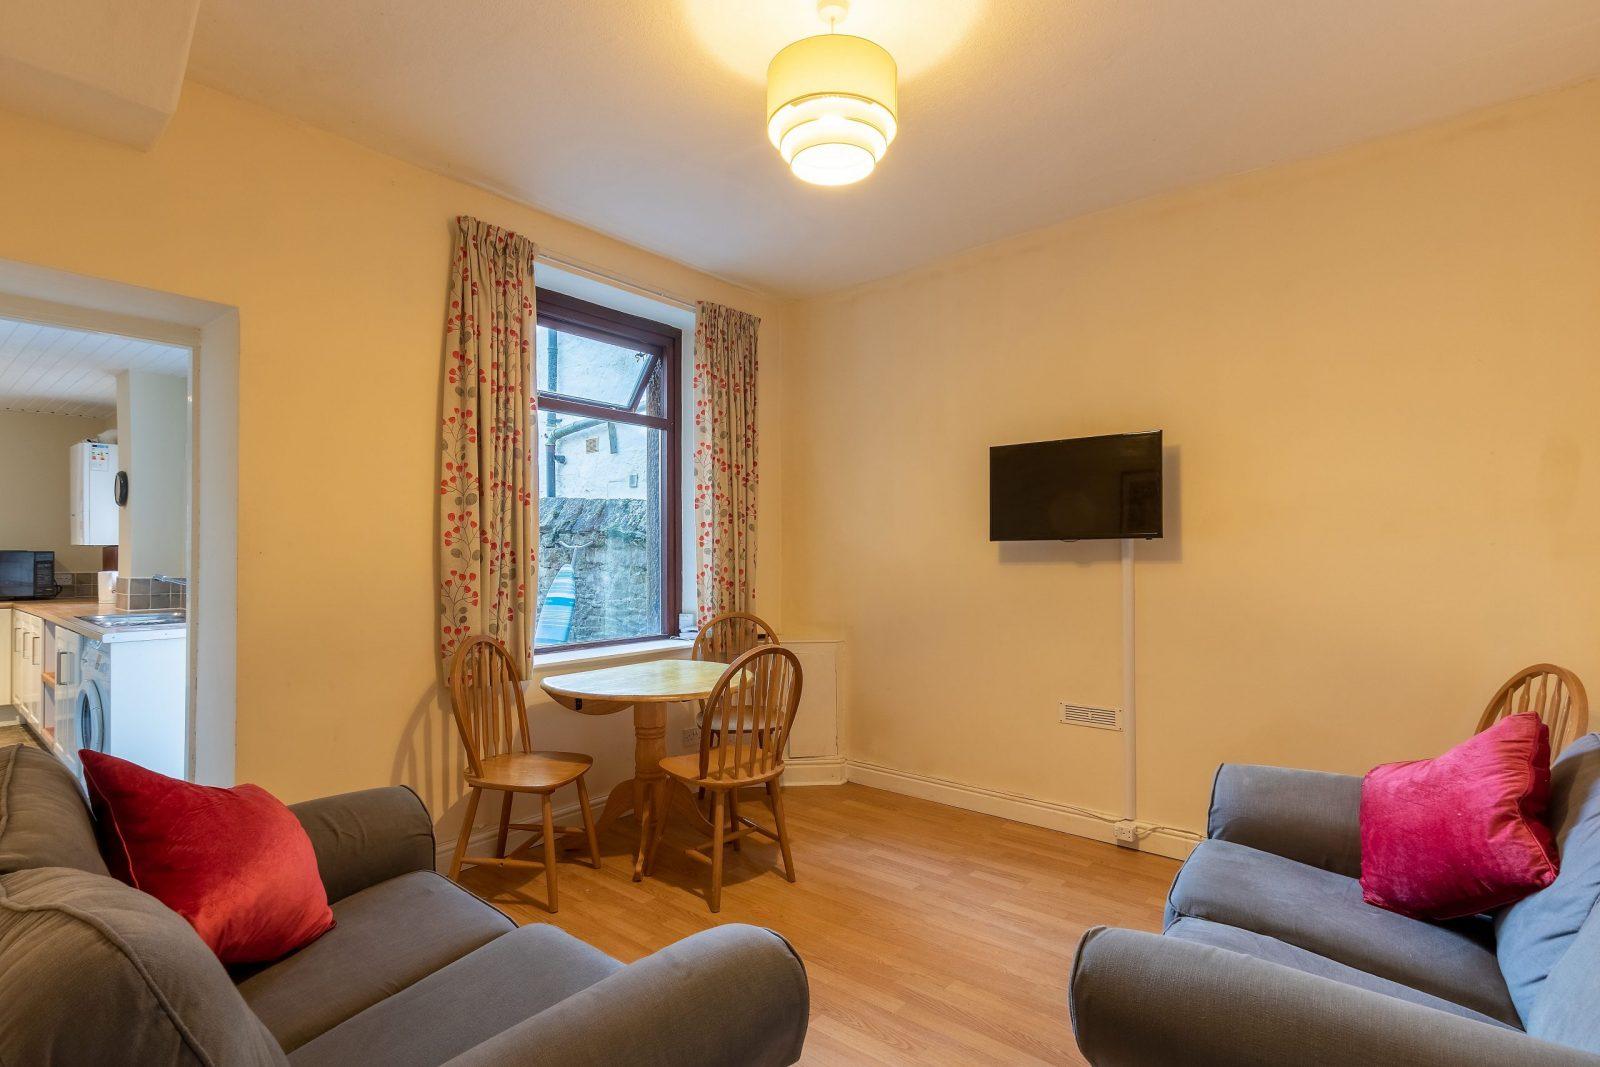 55 Bowerham Road Lancaster Student Accommodation